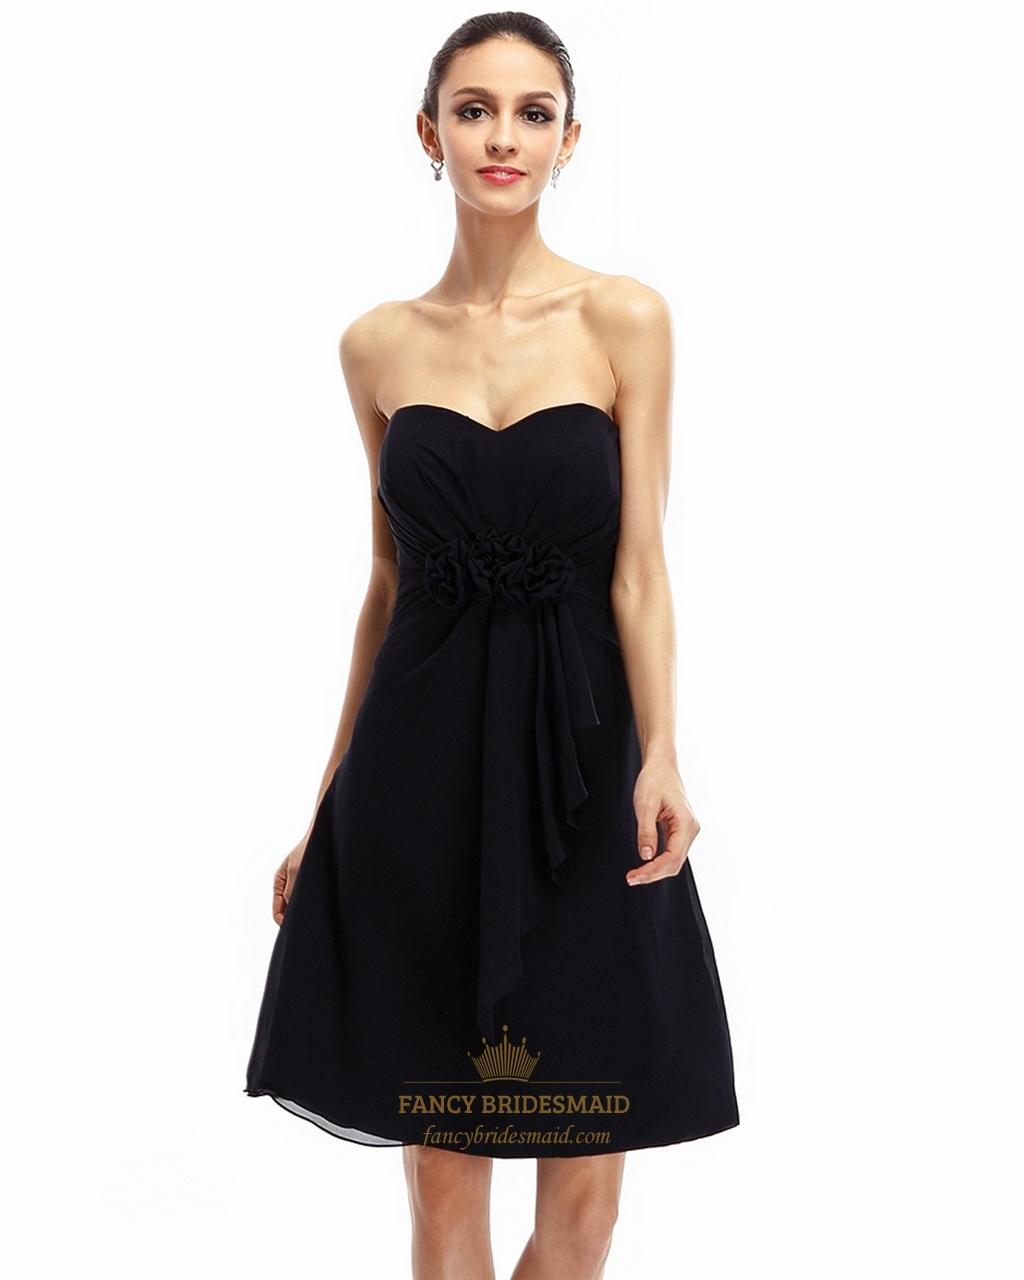 Black Strapless Sweetheart Chiffon Bridesmaid Dress With